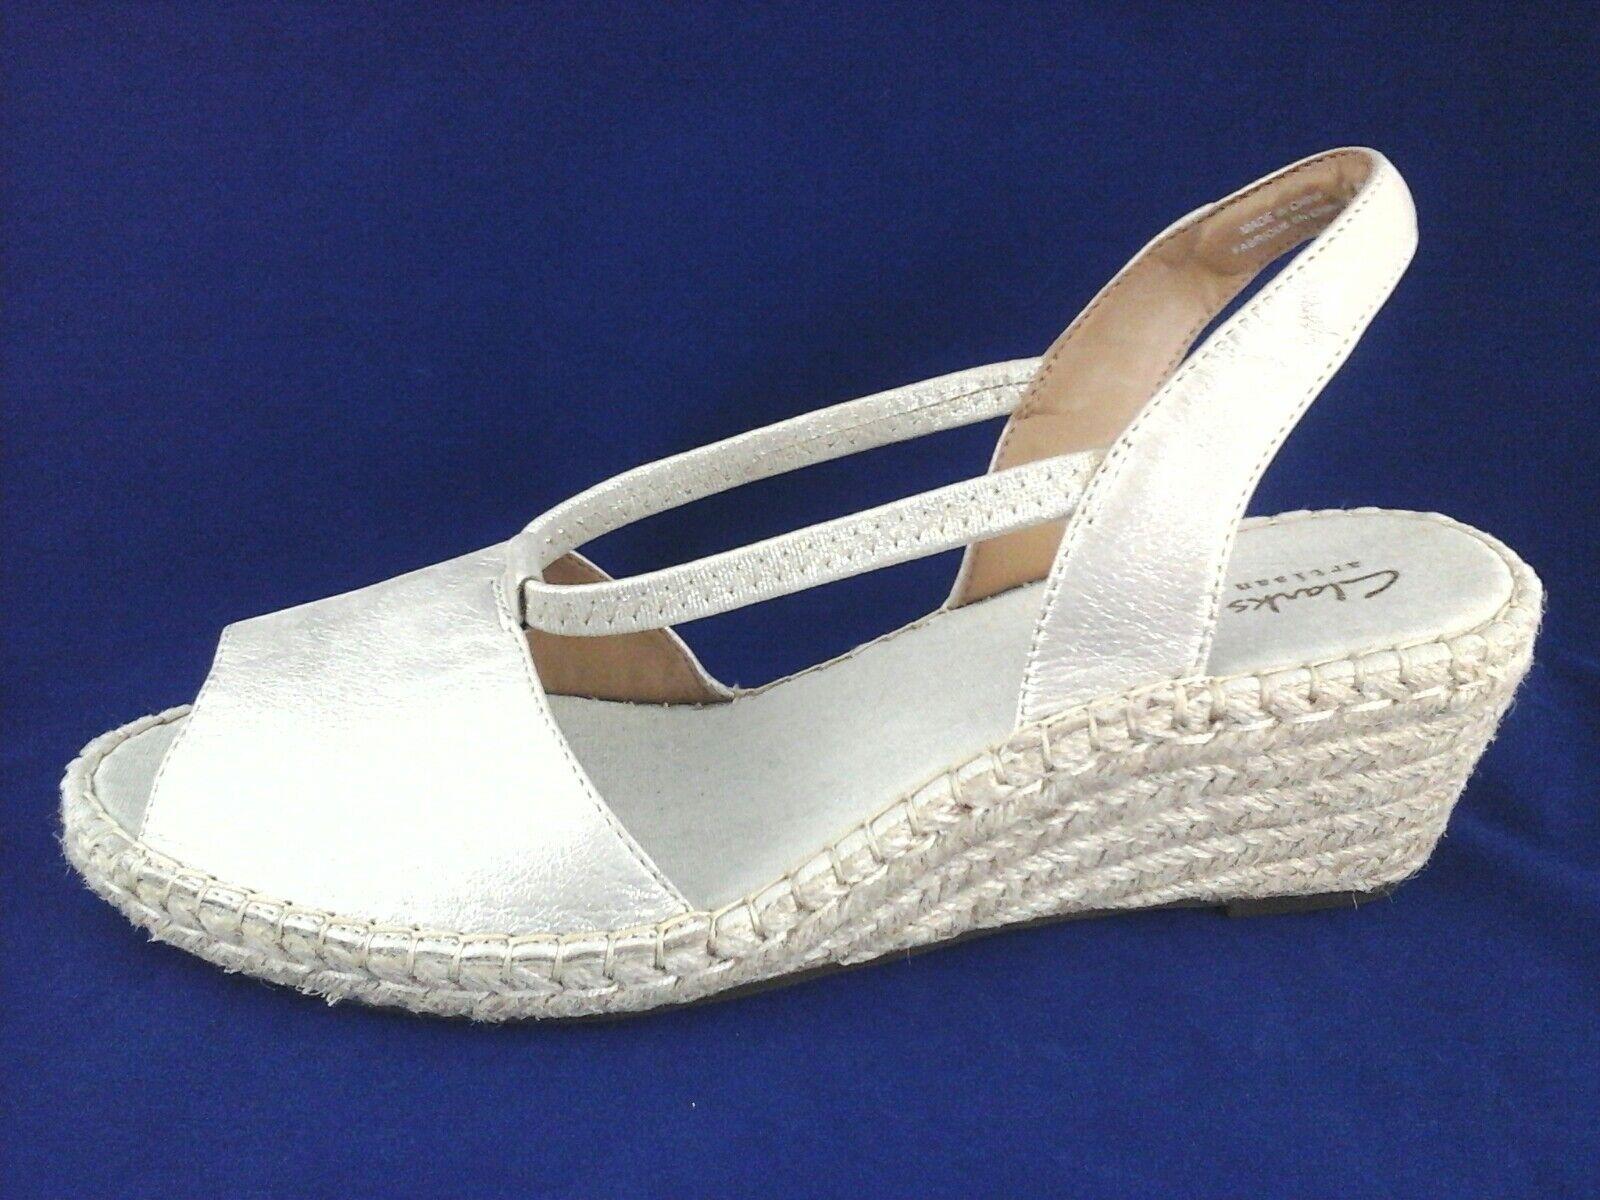 18032a39398 CLARKS Sandals Espadrilles Gold PETRINA LULU Wedge Slip On Womens US ...